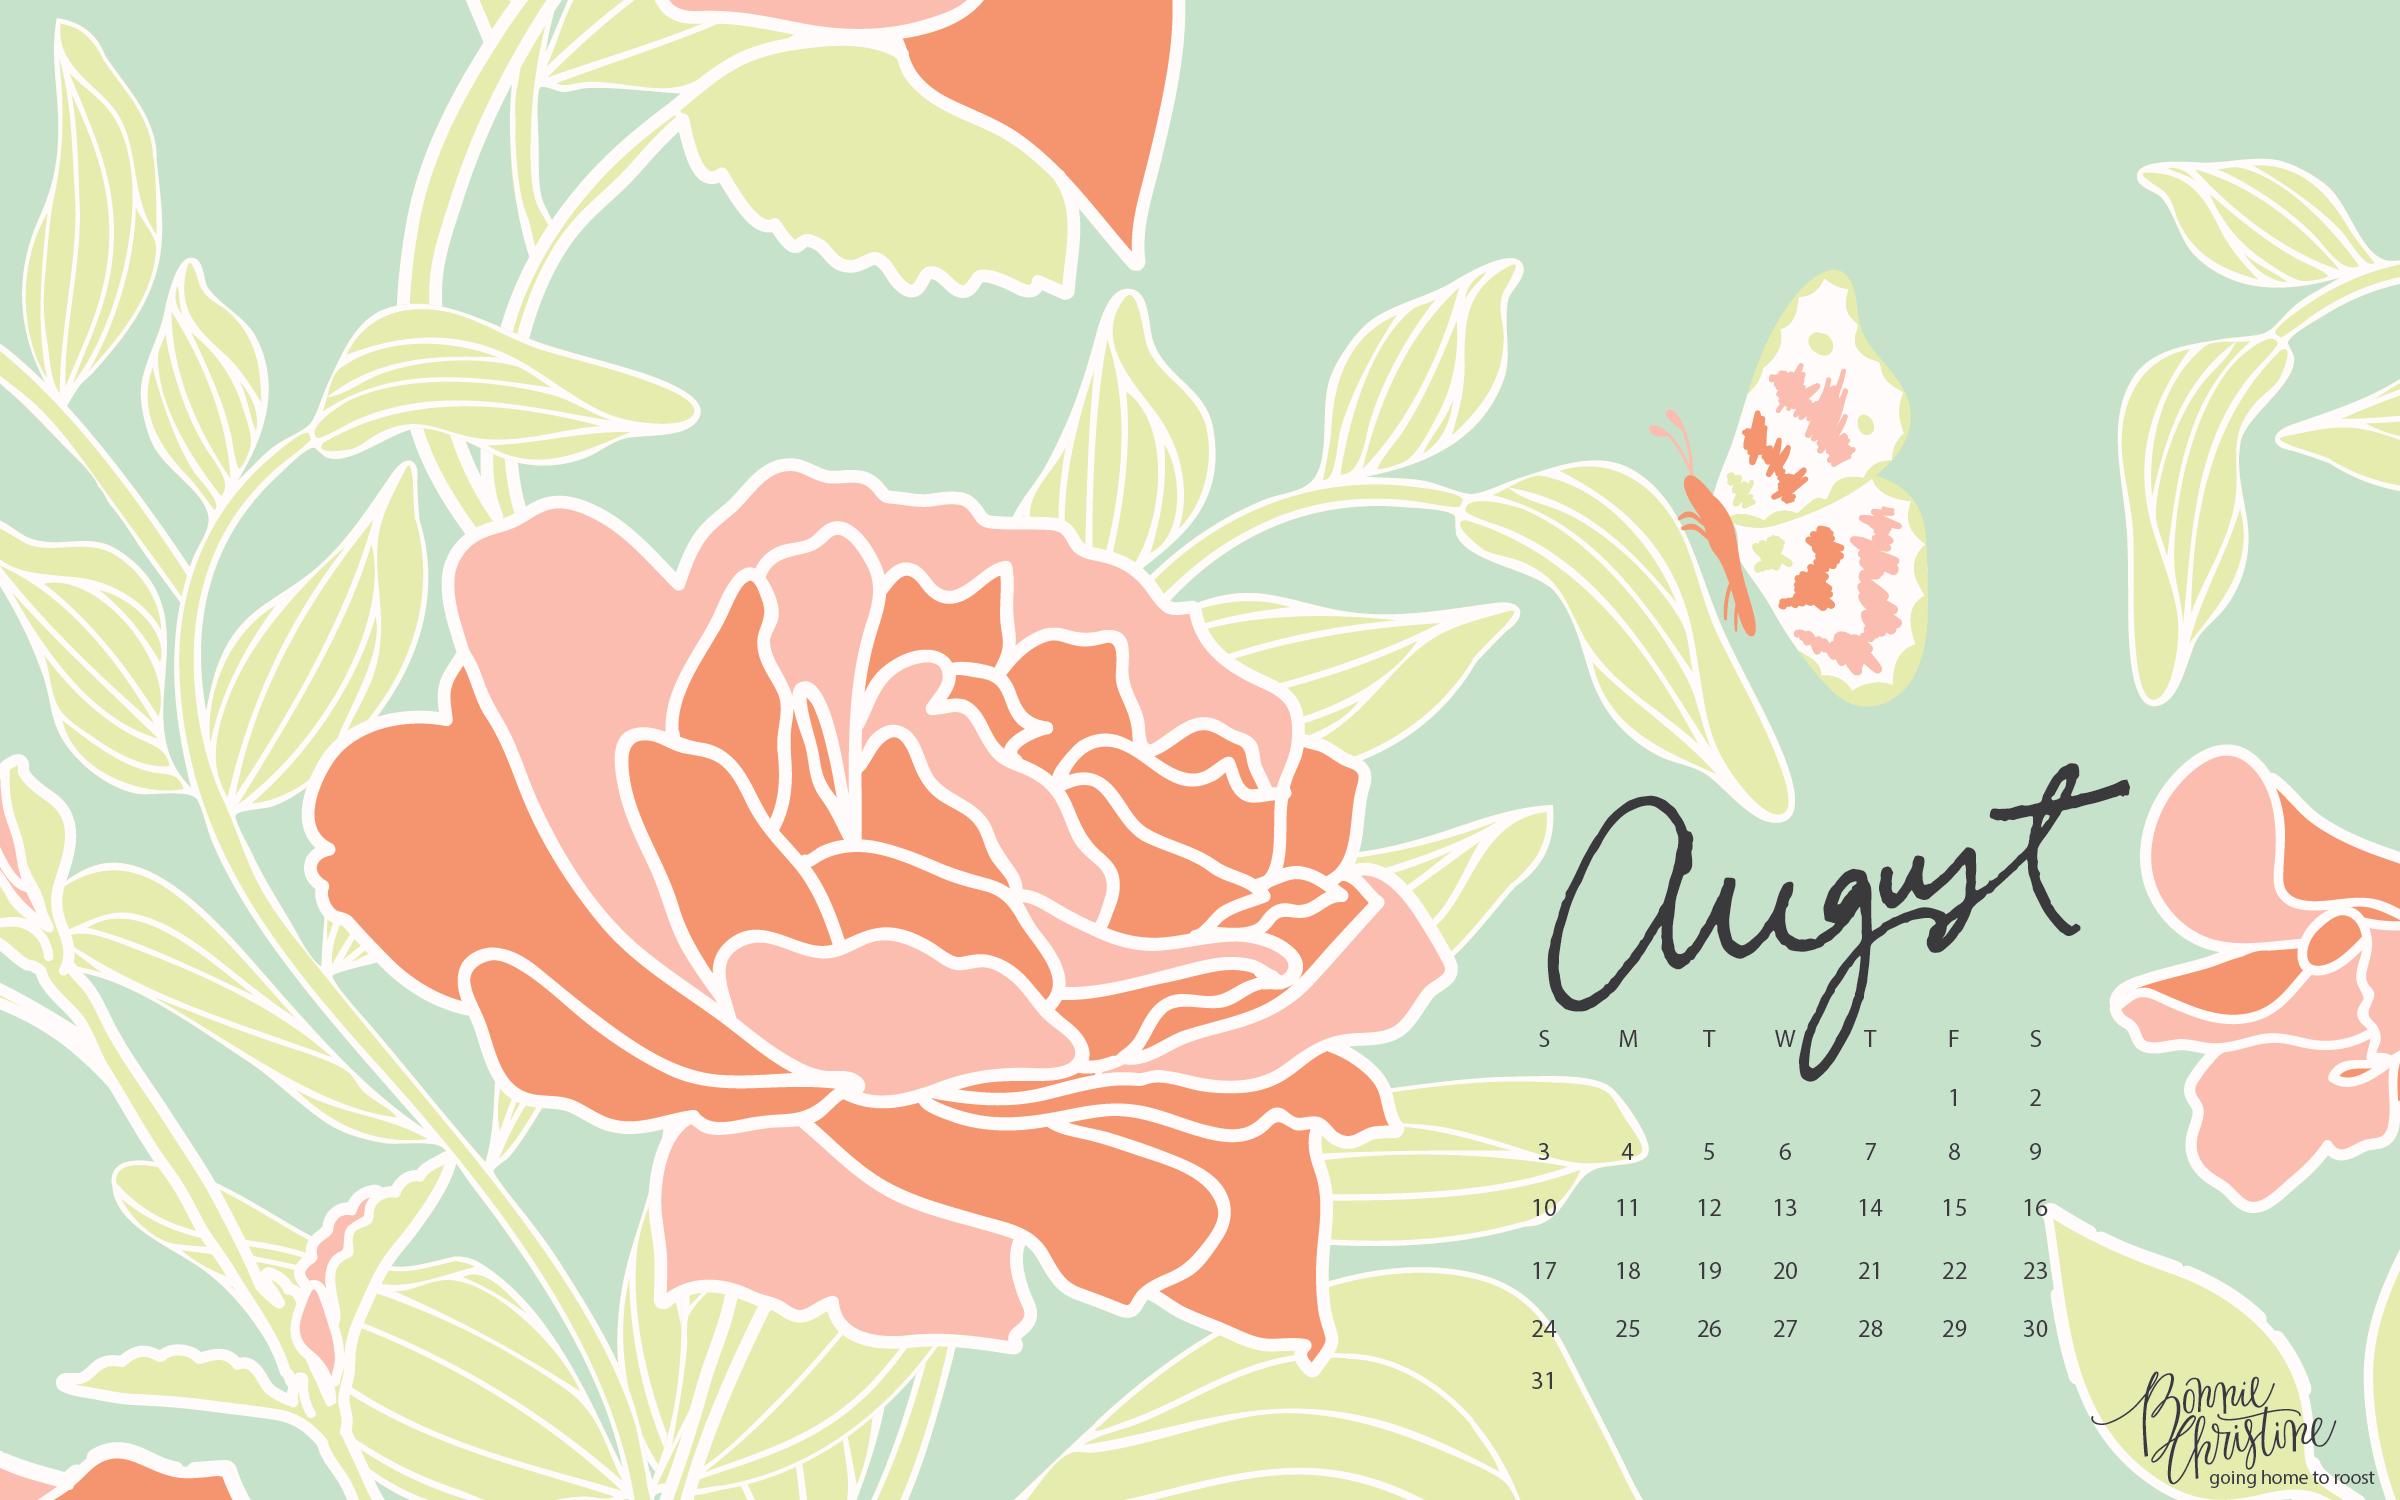 August Desktop Iphone Calendars By Bonnie Christine 6